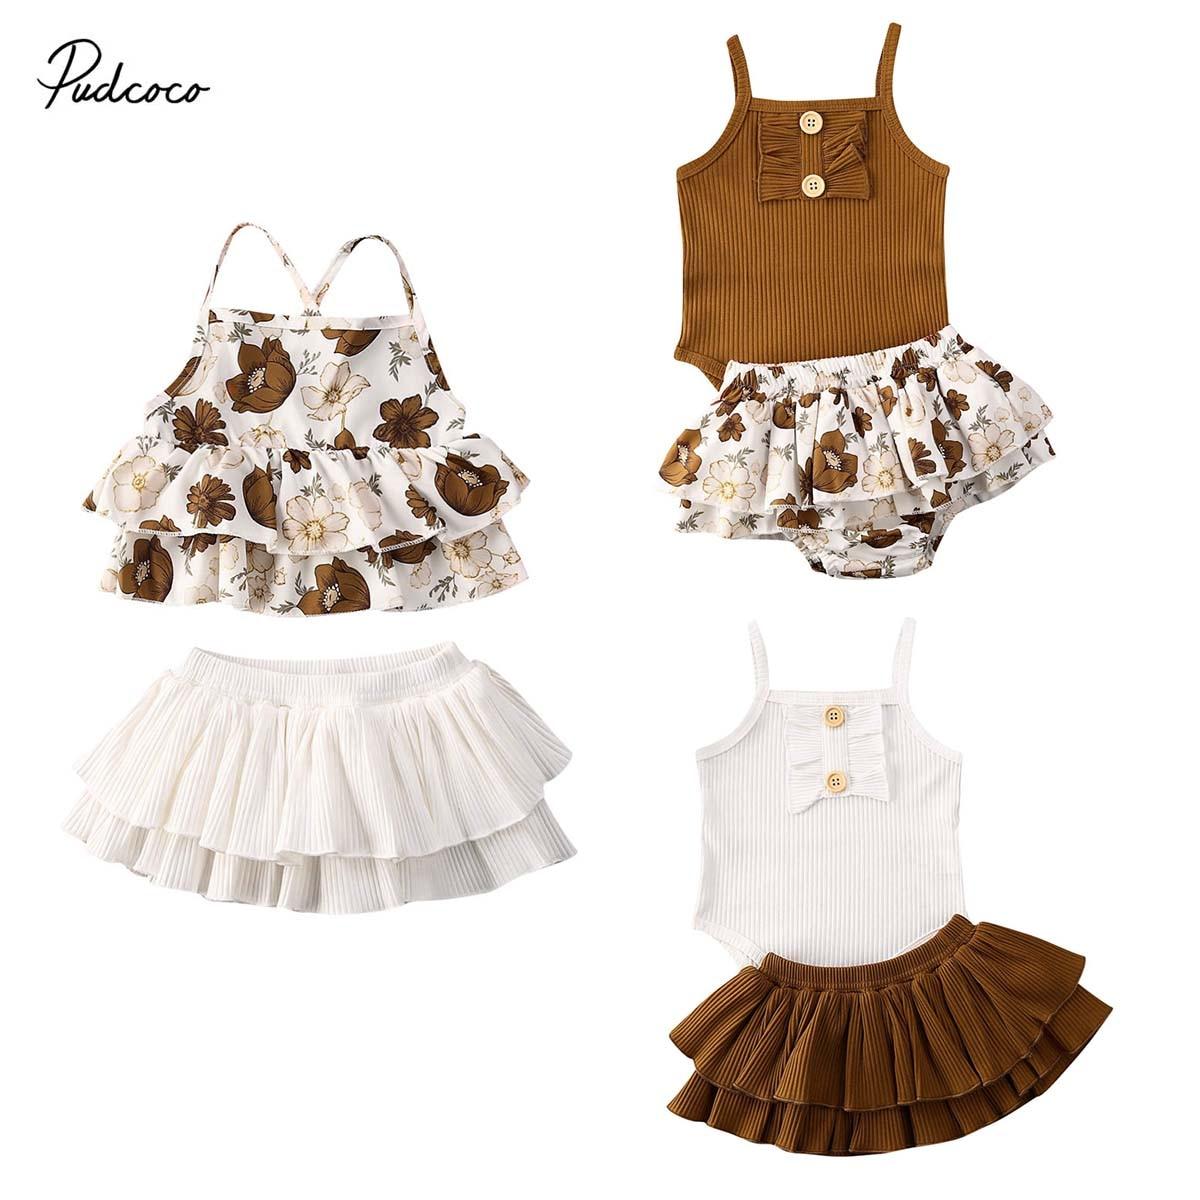 Baby Bottom Newborn Sets for 0-24mos 2Pcs Infant Girl Floral Ruffle Tutu Sleeveless Toddler Top